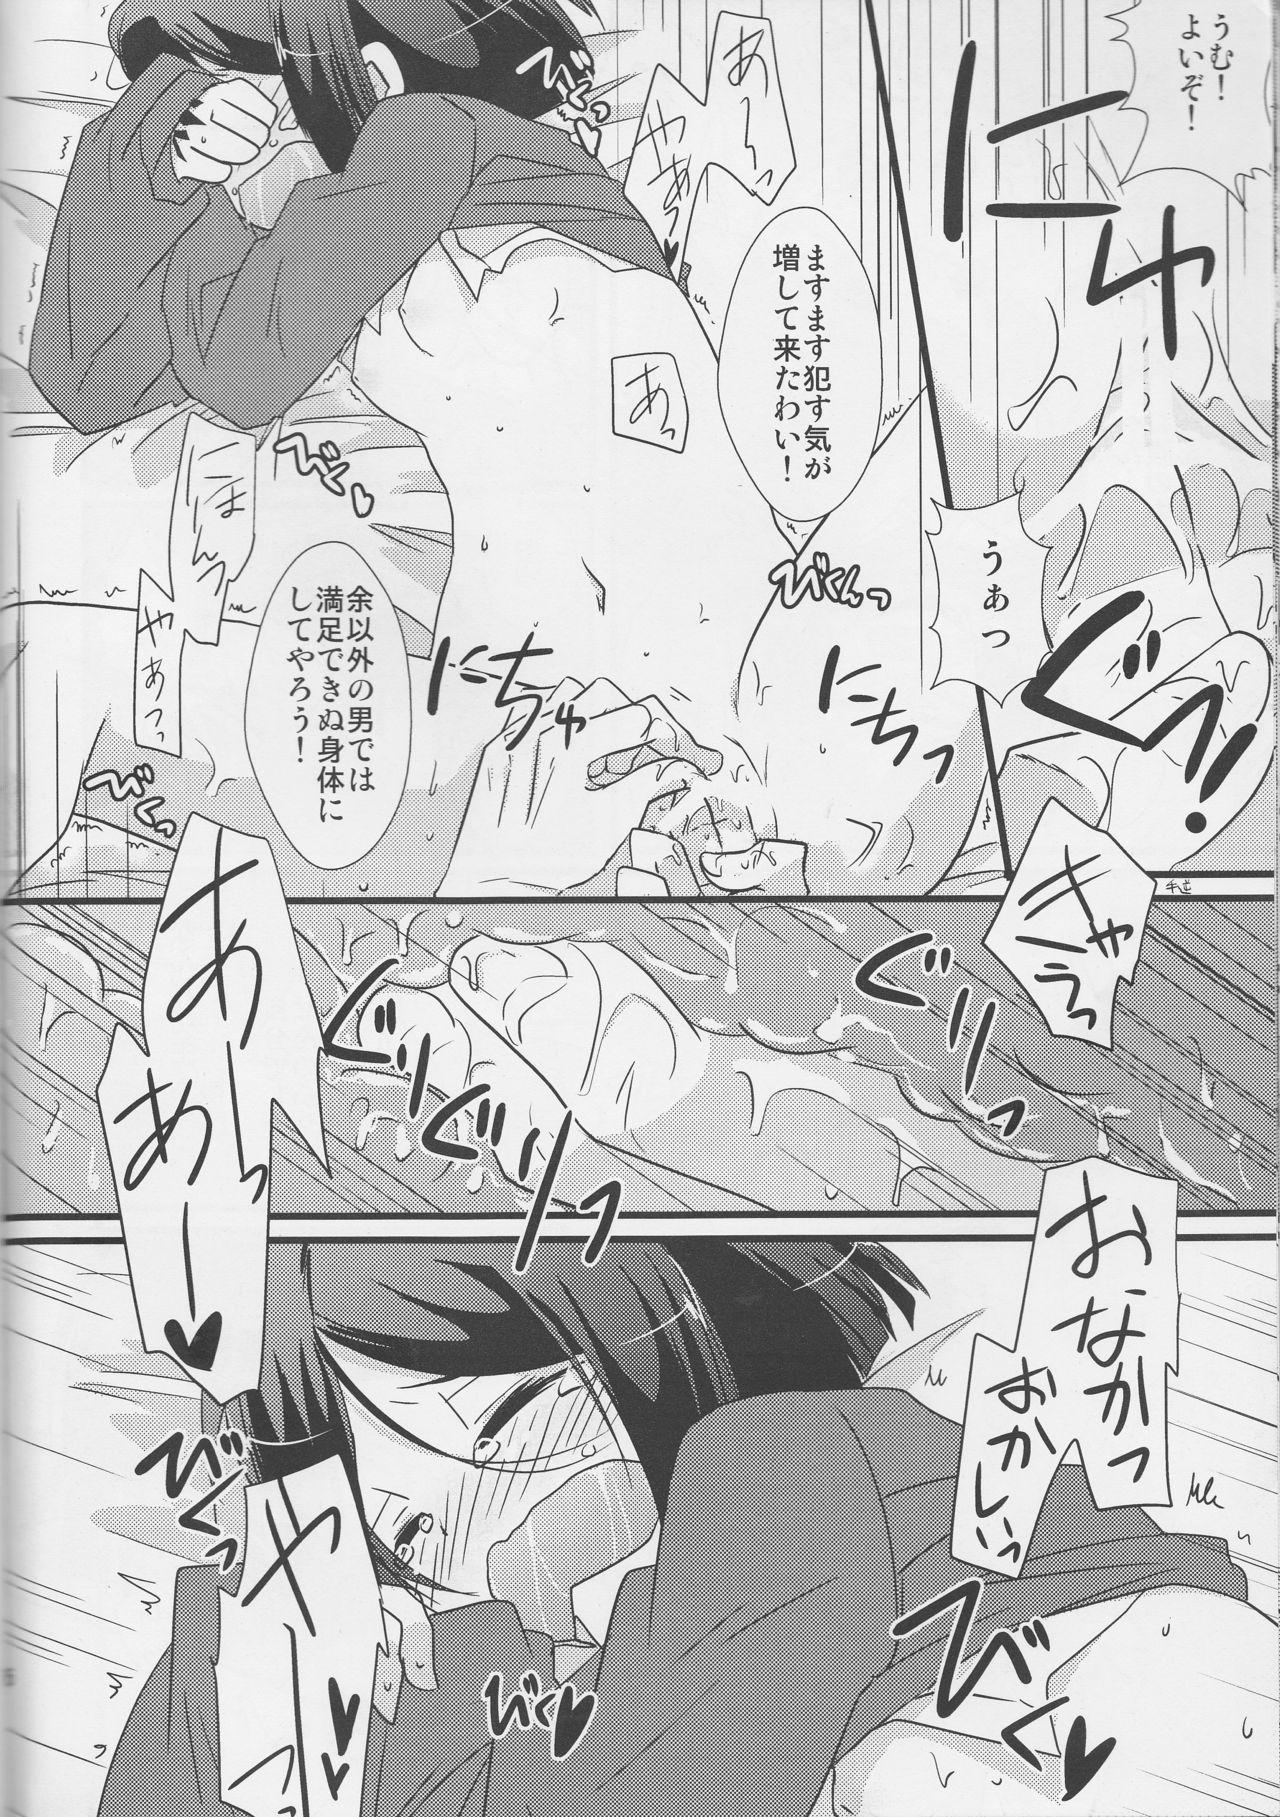 Tsubomi 15